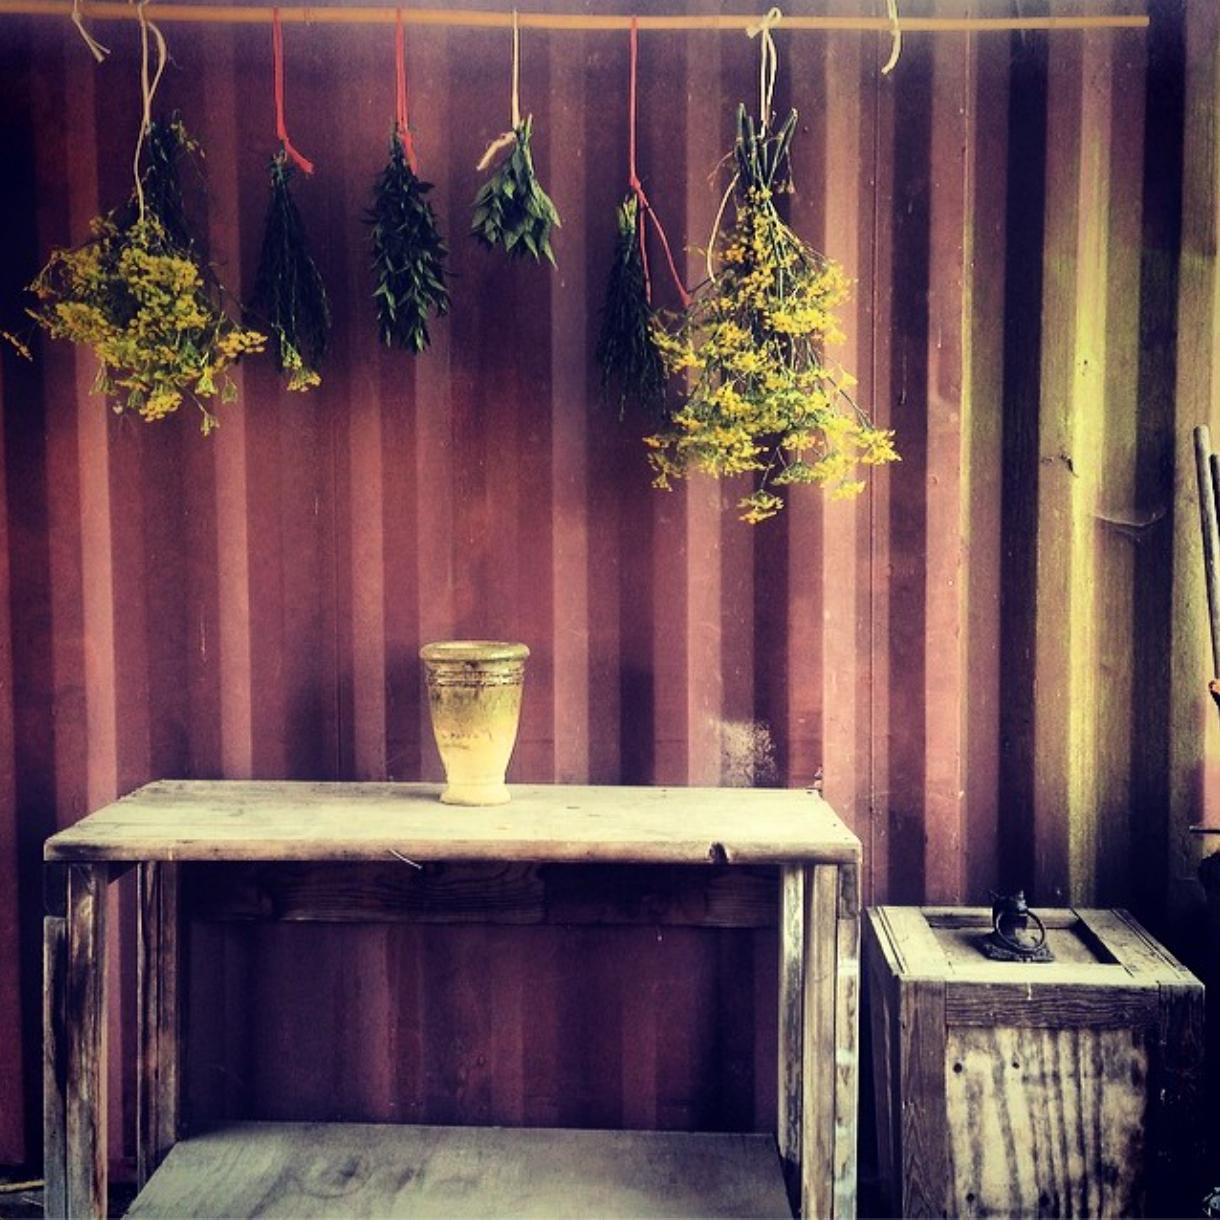 drying herbsjpg.jpg